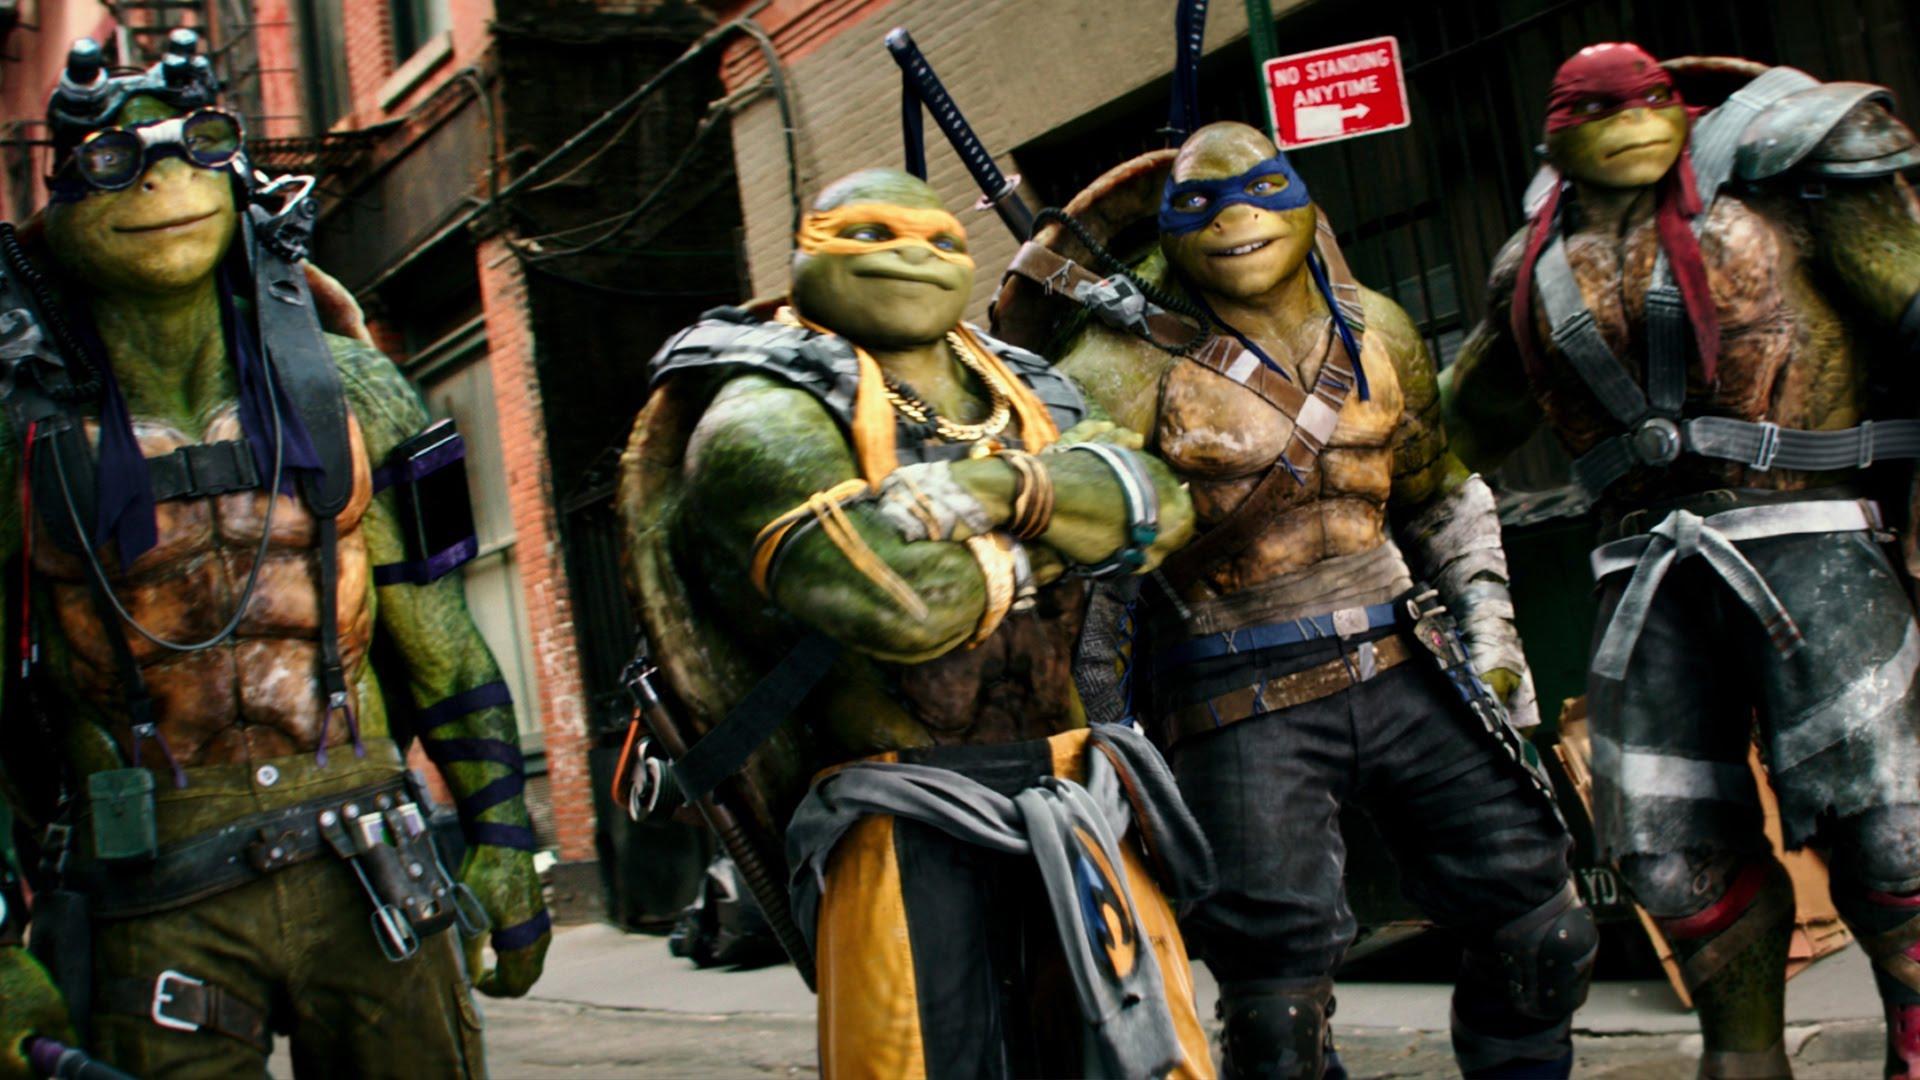 Batalha nas telonas: José Aldo x As Tartarugas Ninja | Folha Vitória